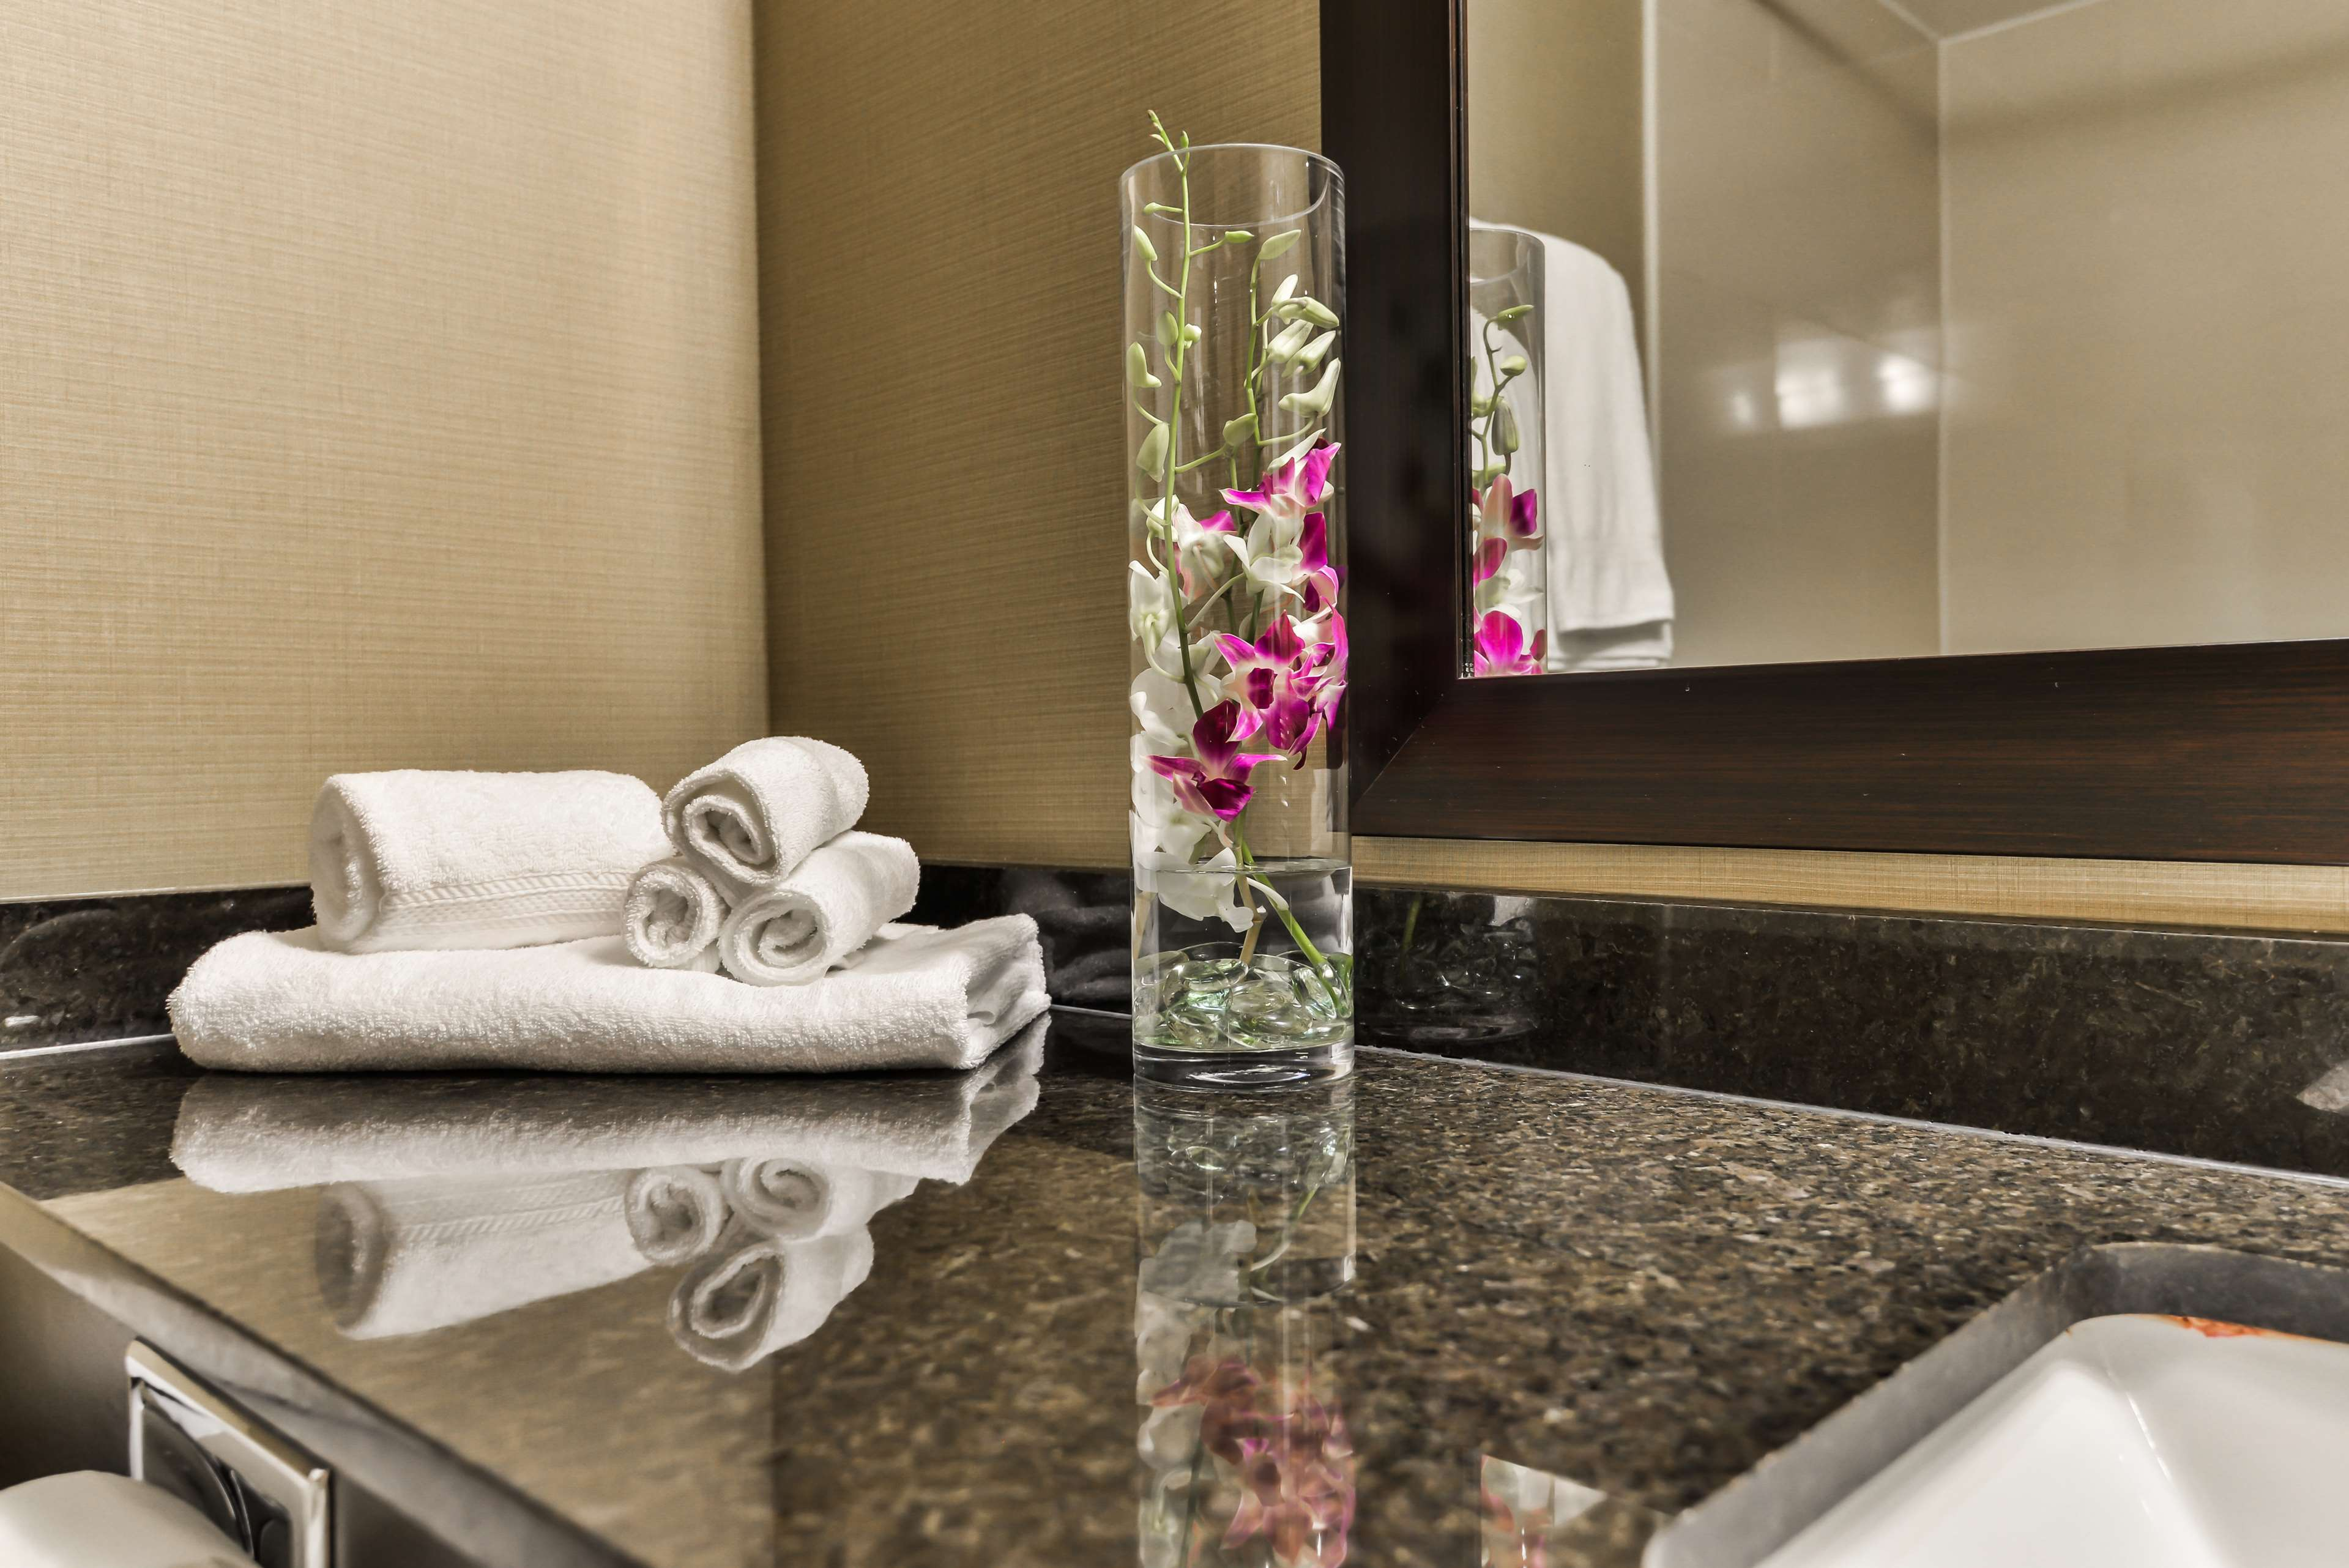 Guest Bathroom Best Western Plus Leamington Hotel & Conference Centre Leamington (519)326-8646